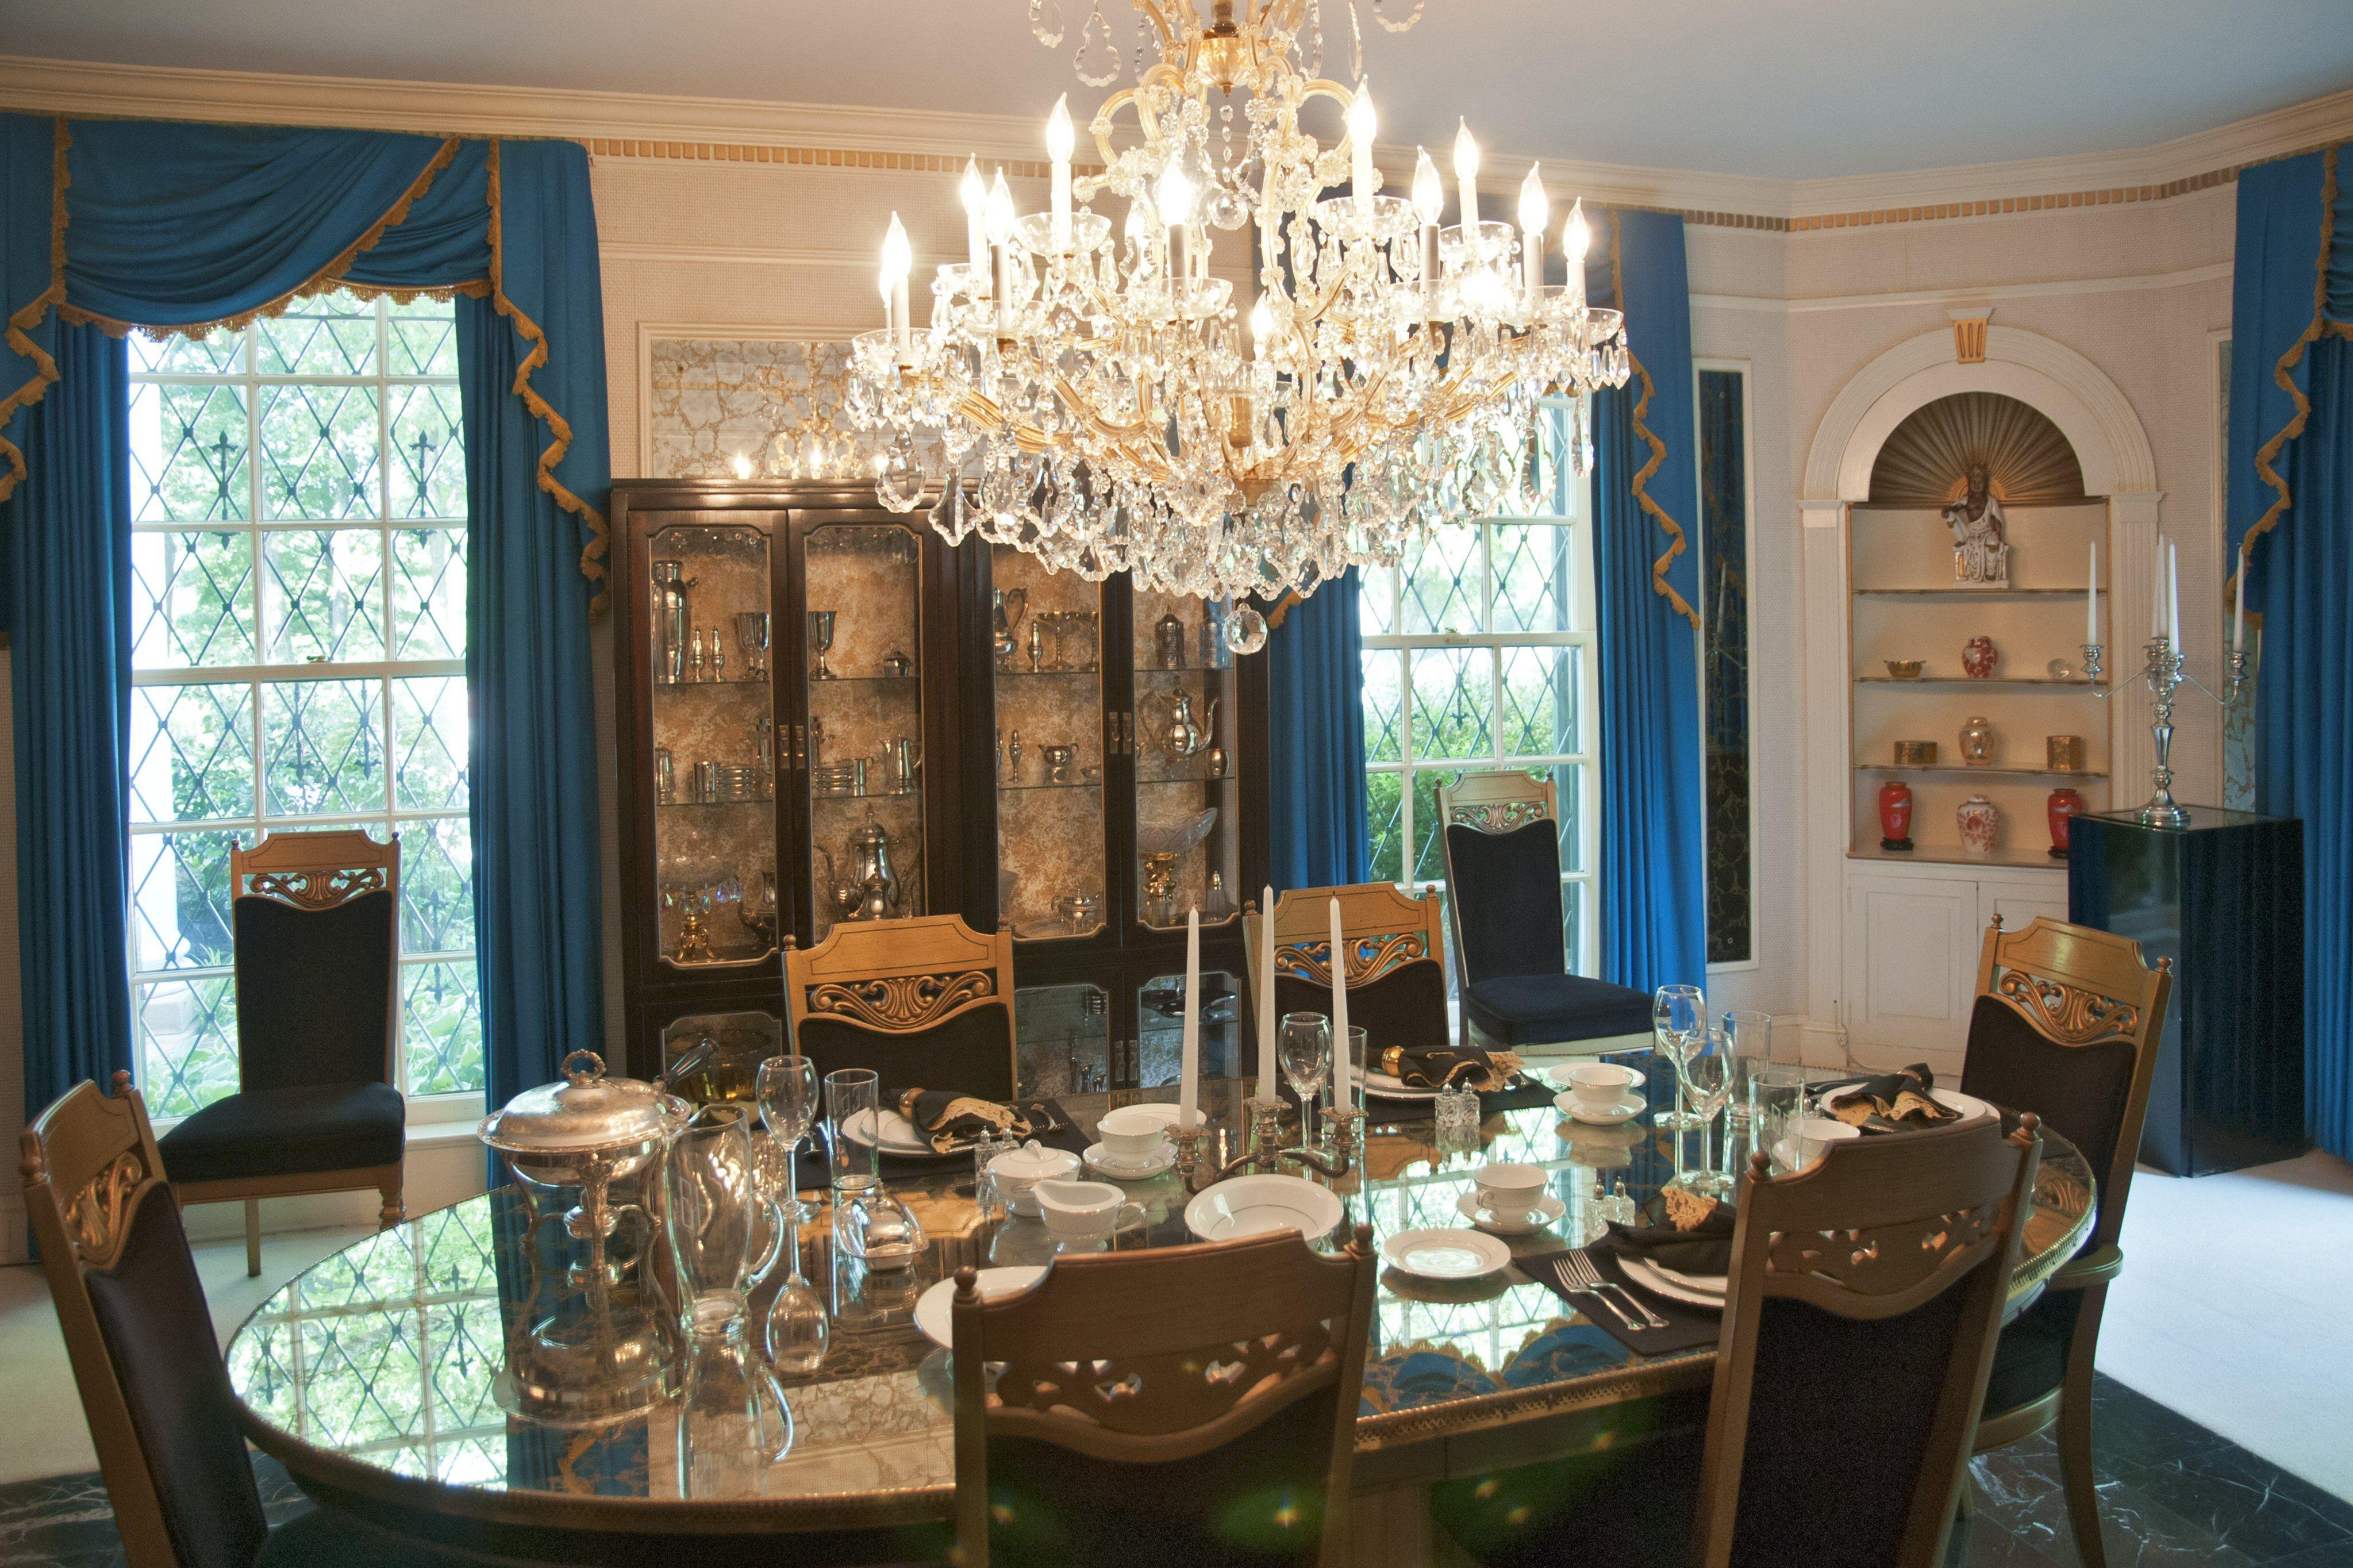 A Look at Graceland Mansion, Home of Elvis